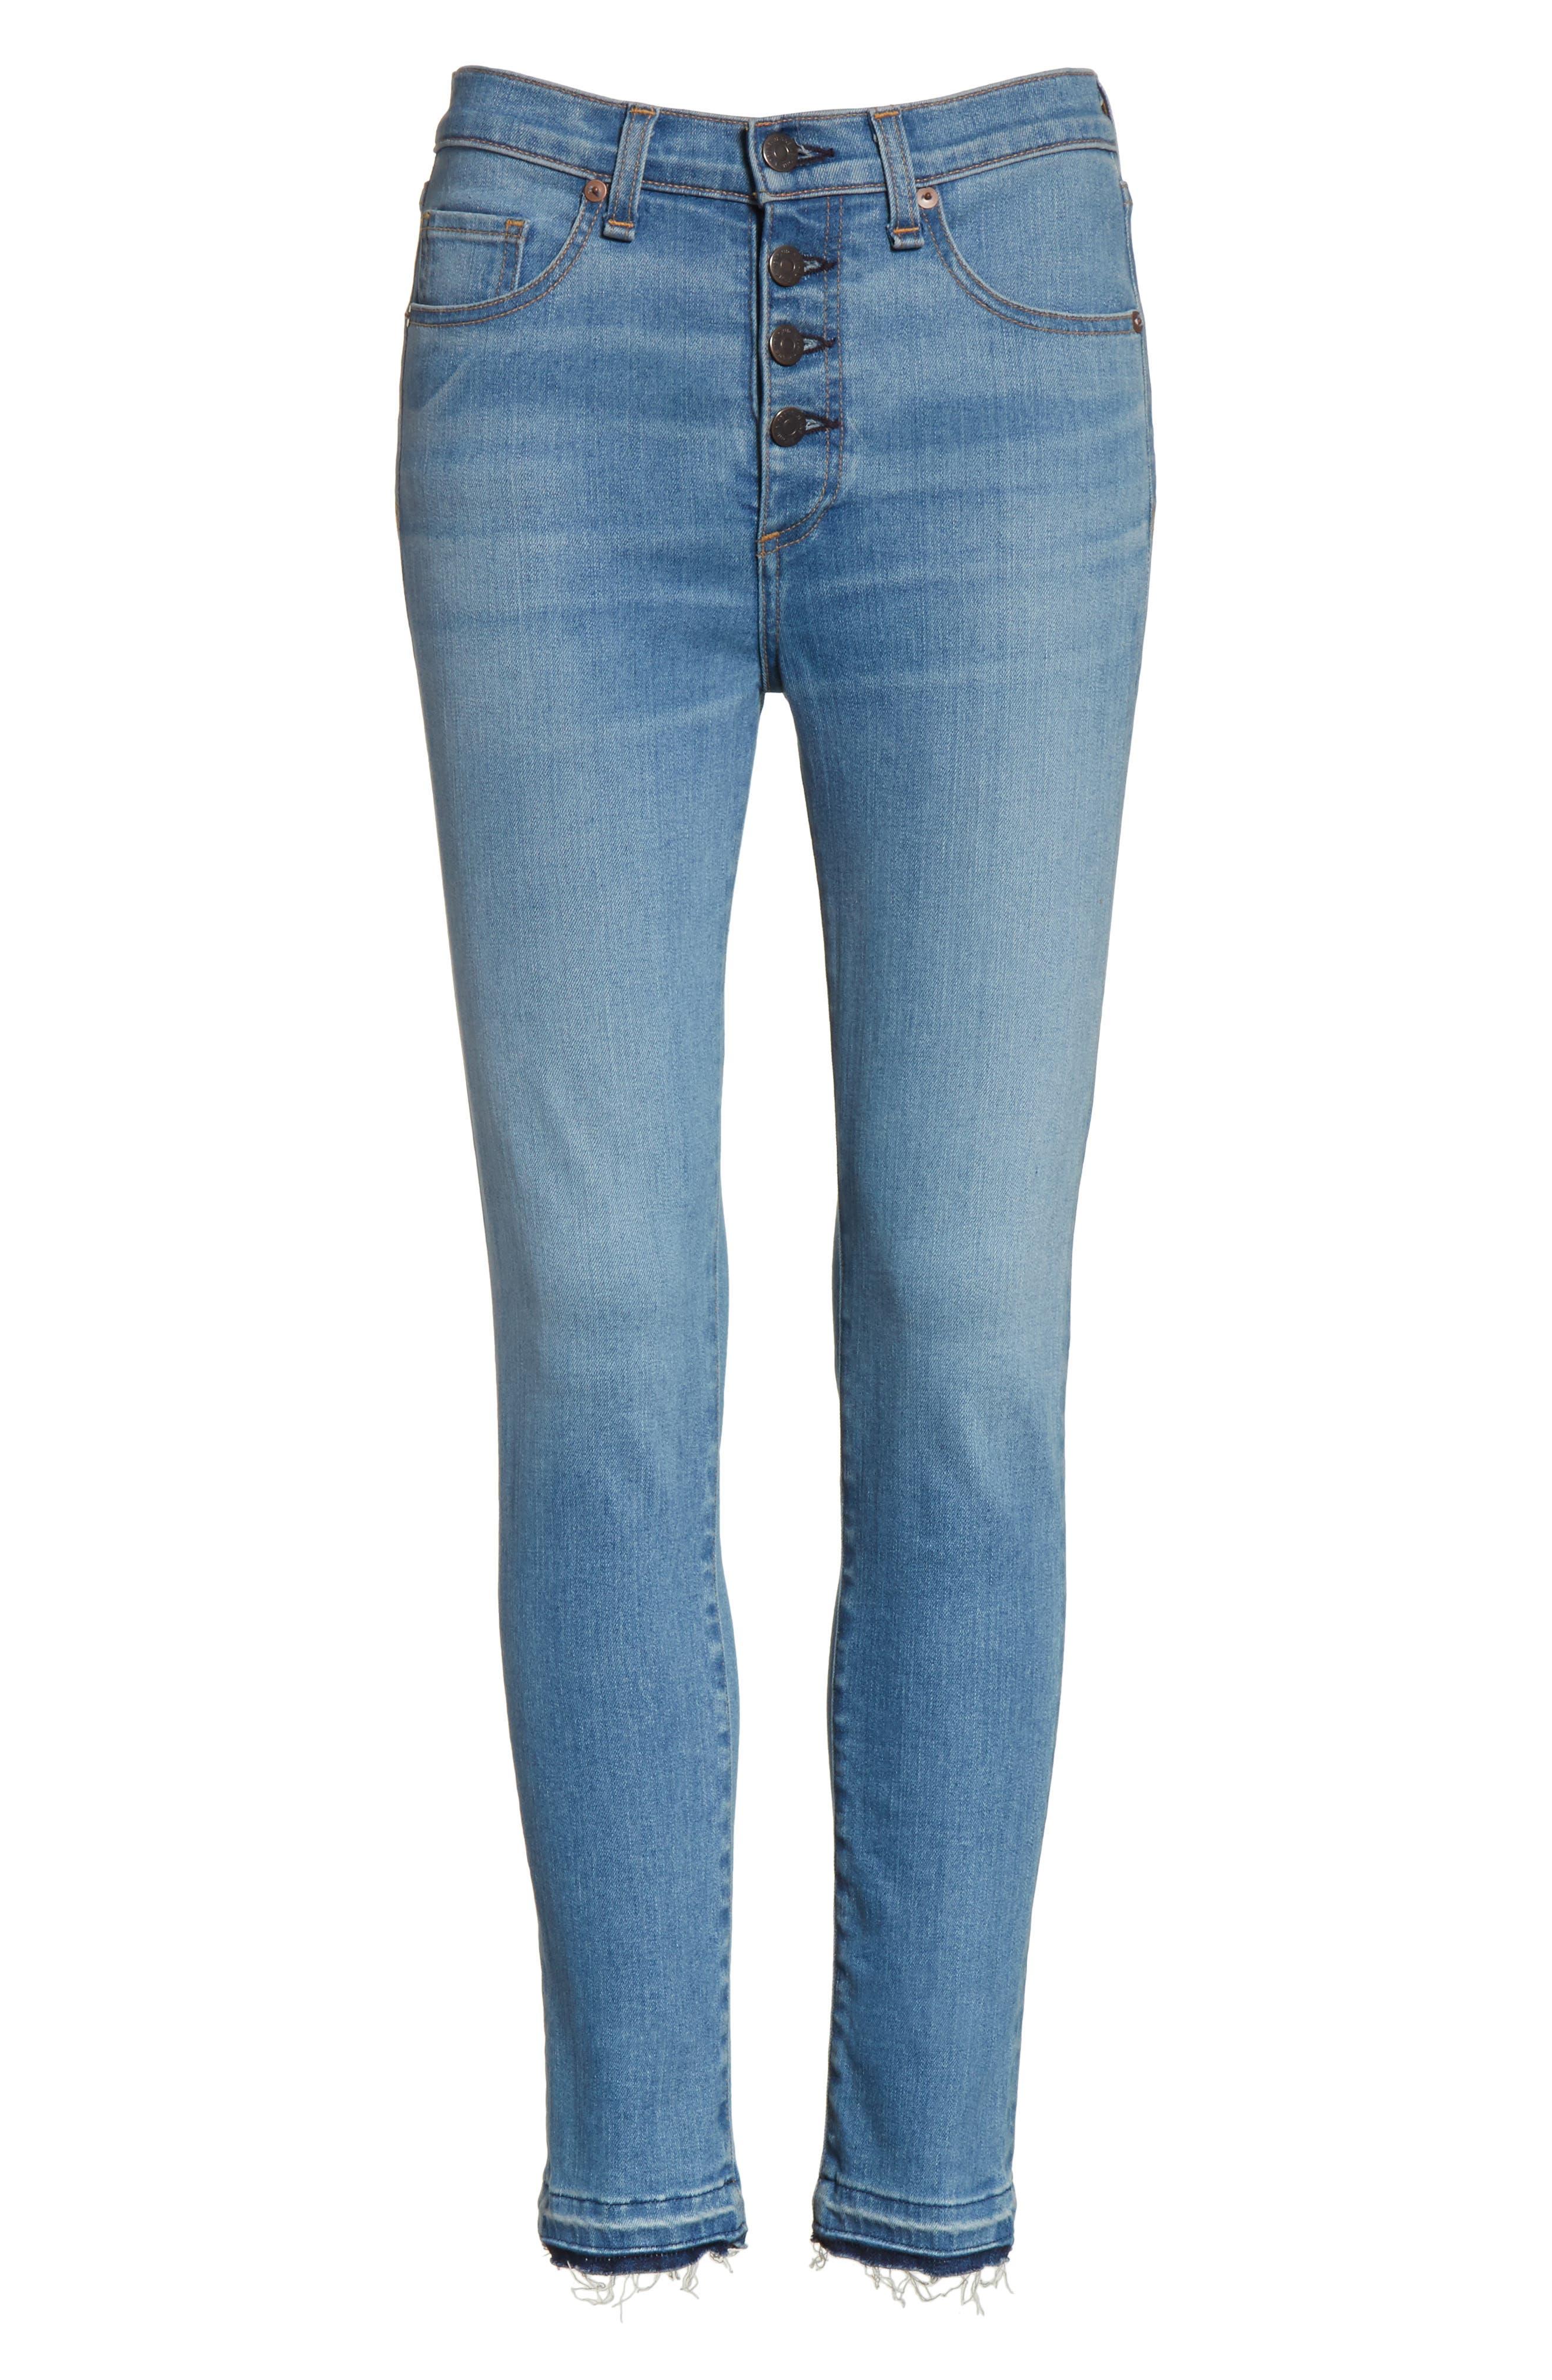 Debbie High Waist Fray Hem Jeans,                             Alternate thumbnail 6, color,                             Retro Blue